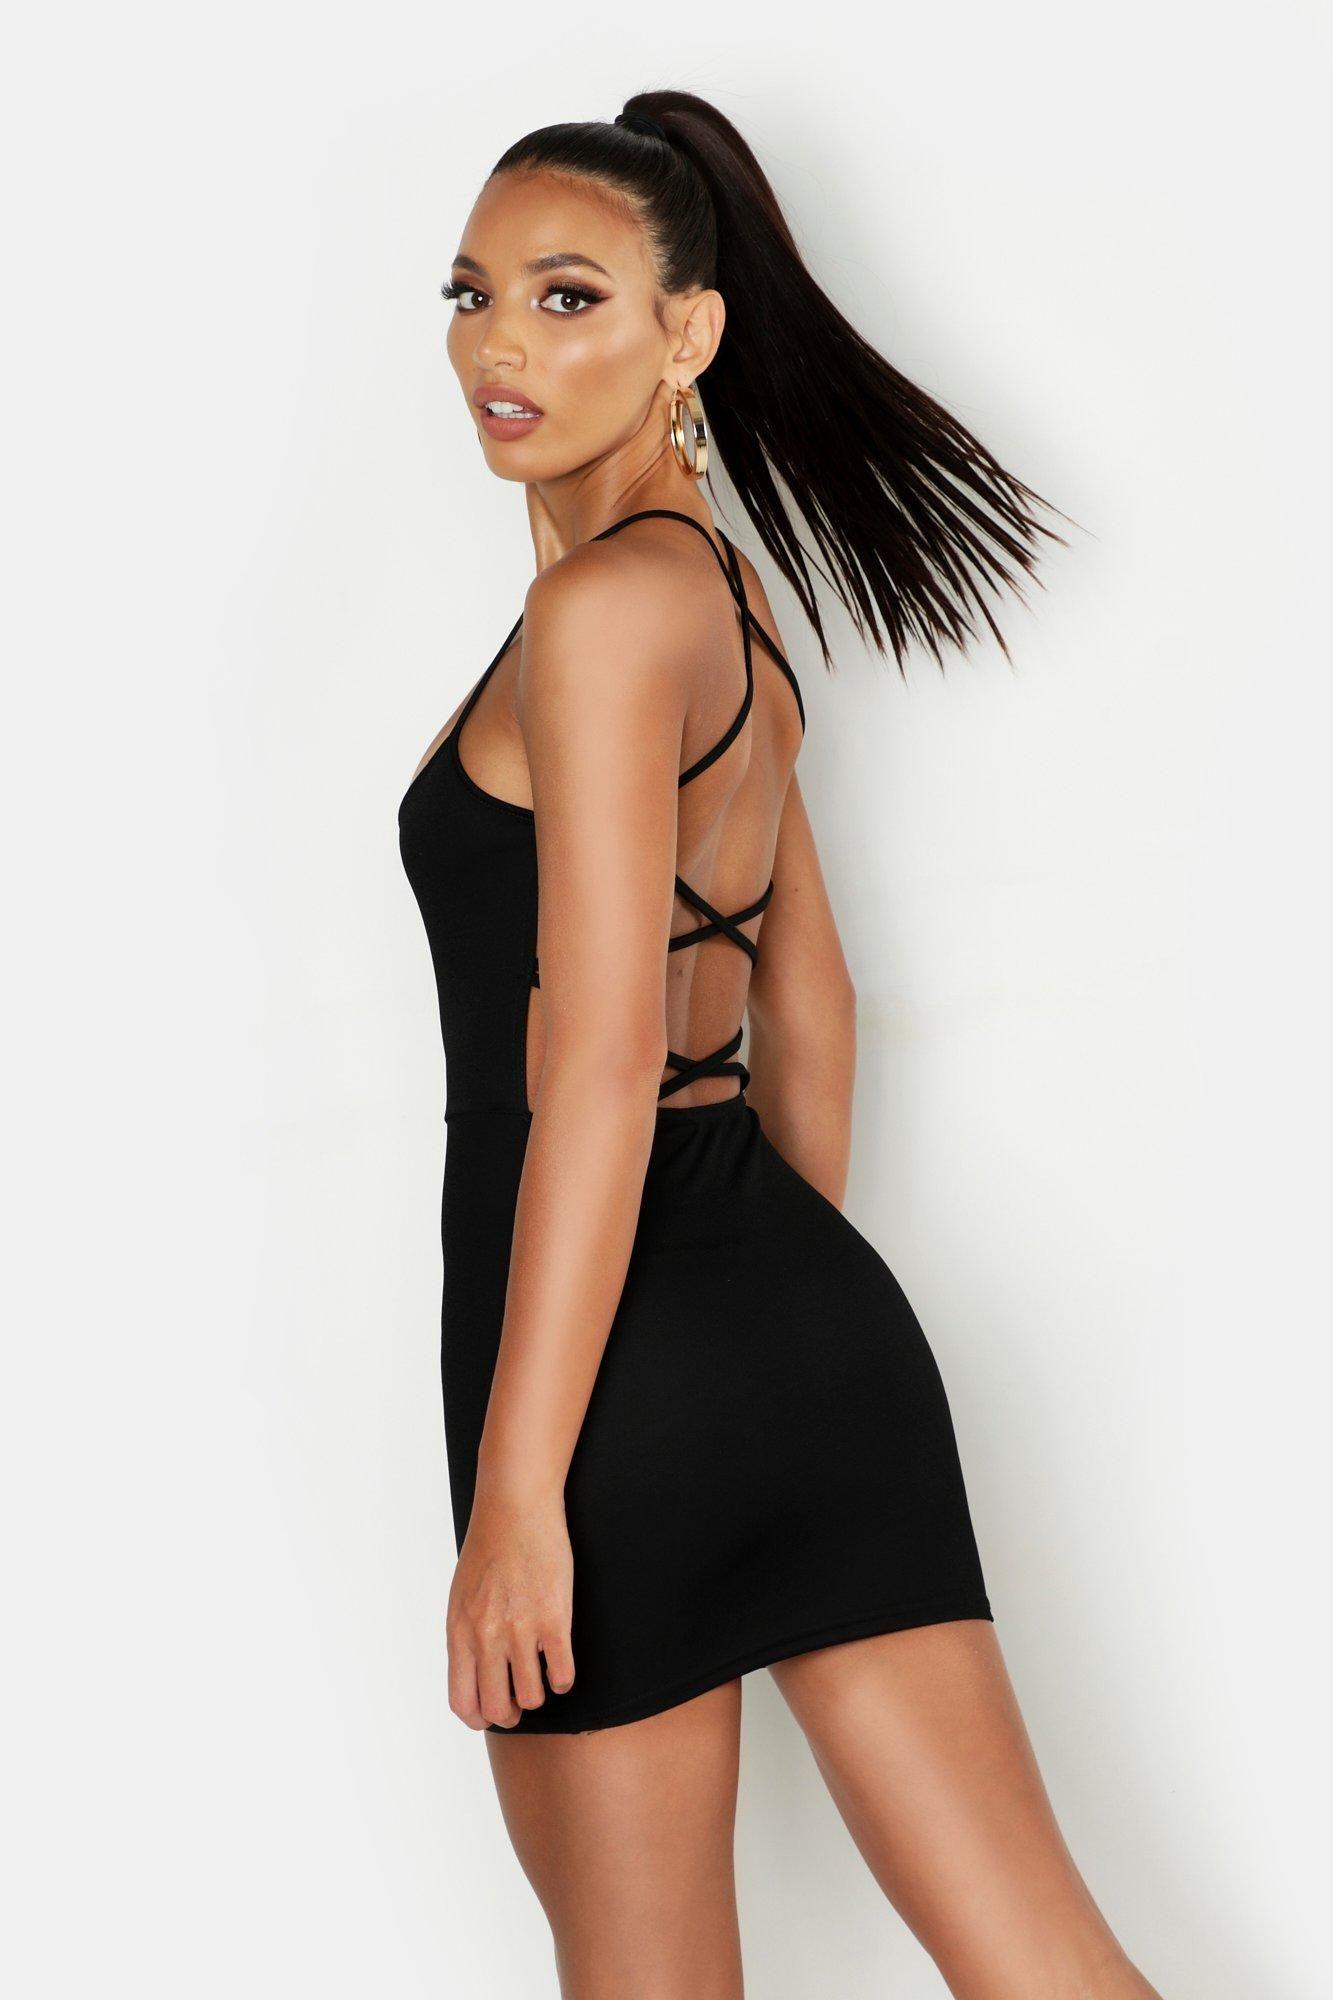 Cross Strappy Back Bodycon Dress Boohoo In 2020 Black Bodycon Dress Bodycon Fashion Fashion